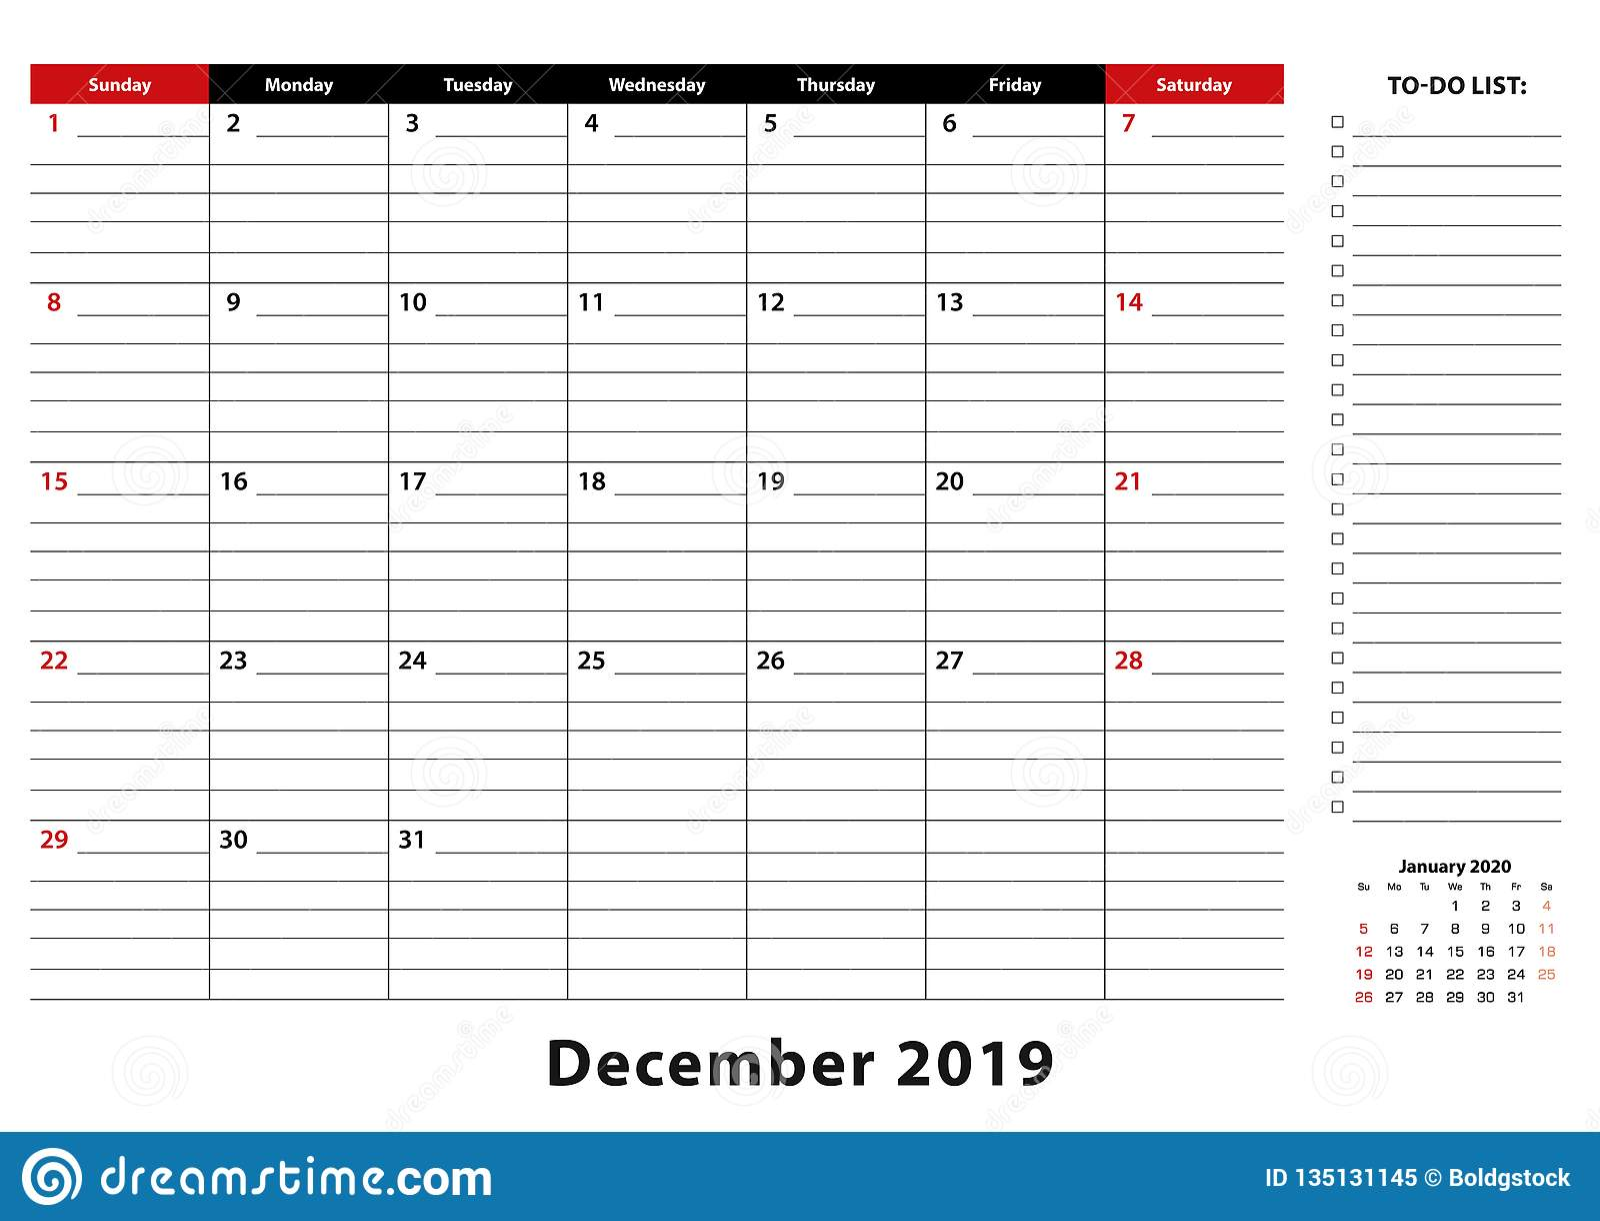 December 2019 Monthly Desk Pad Calendar Week Starts From Sunday